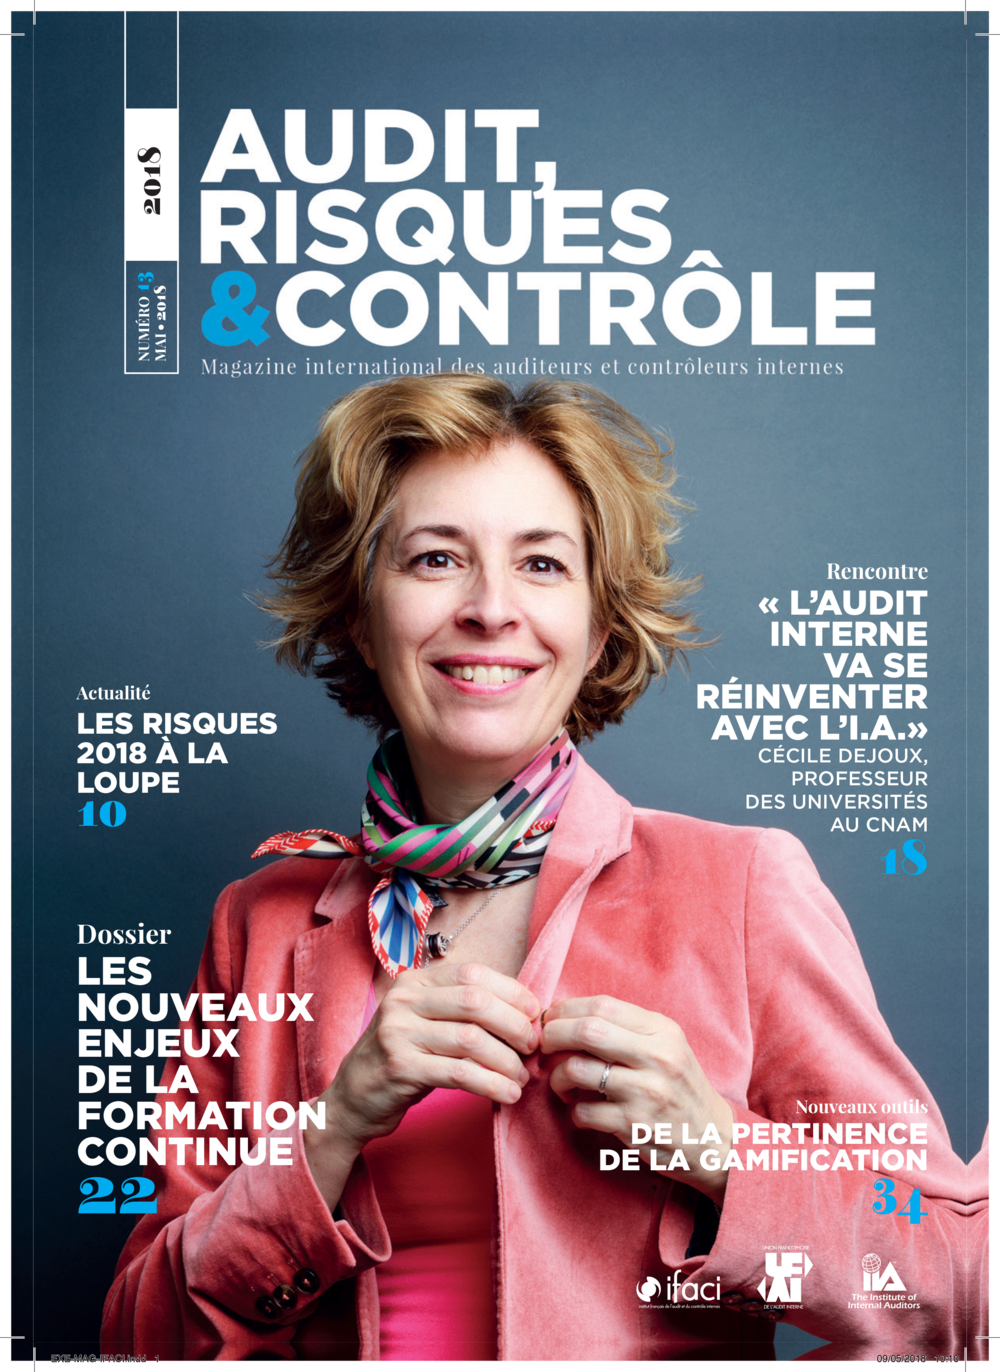 Couverture-magazine-mai.png